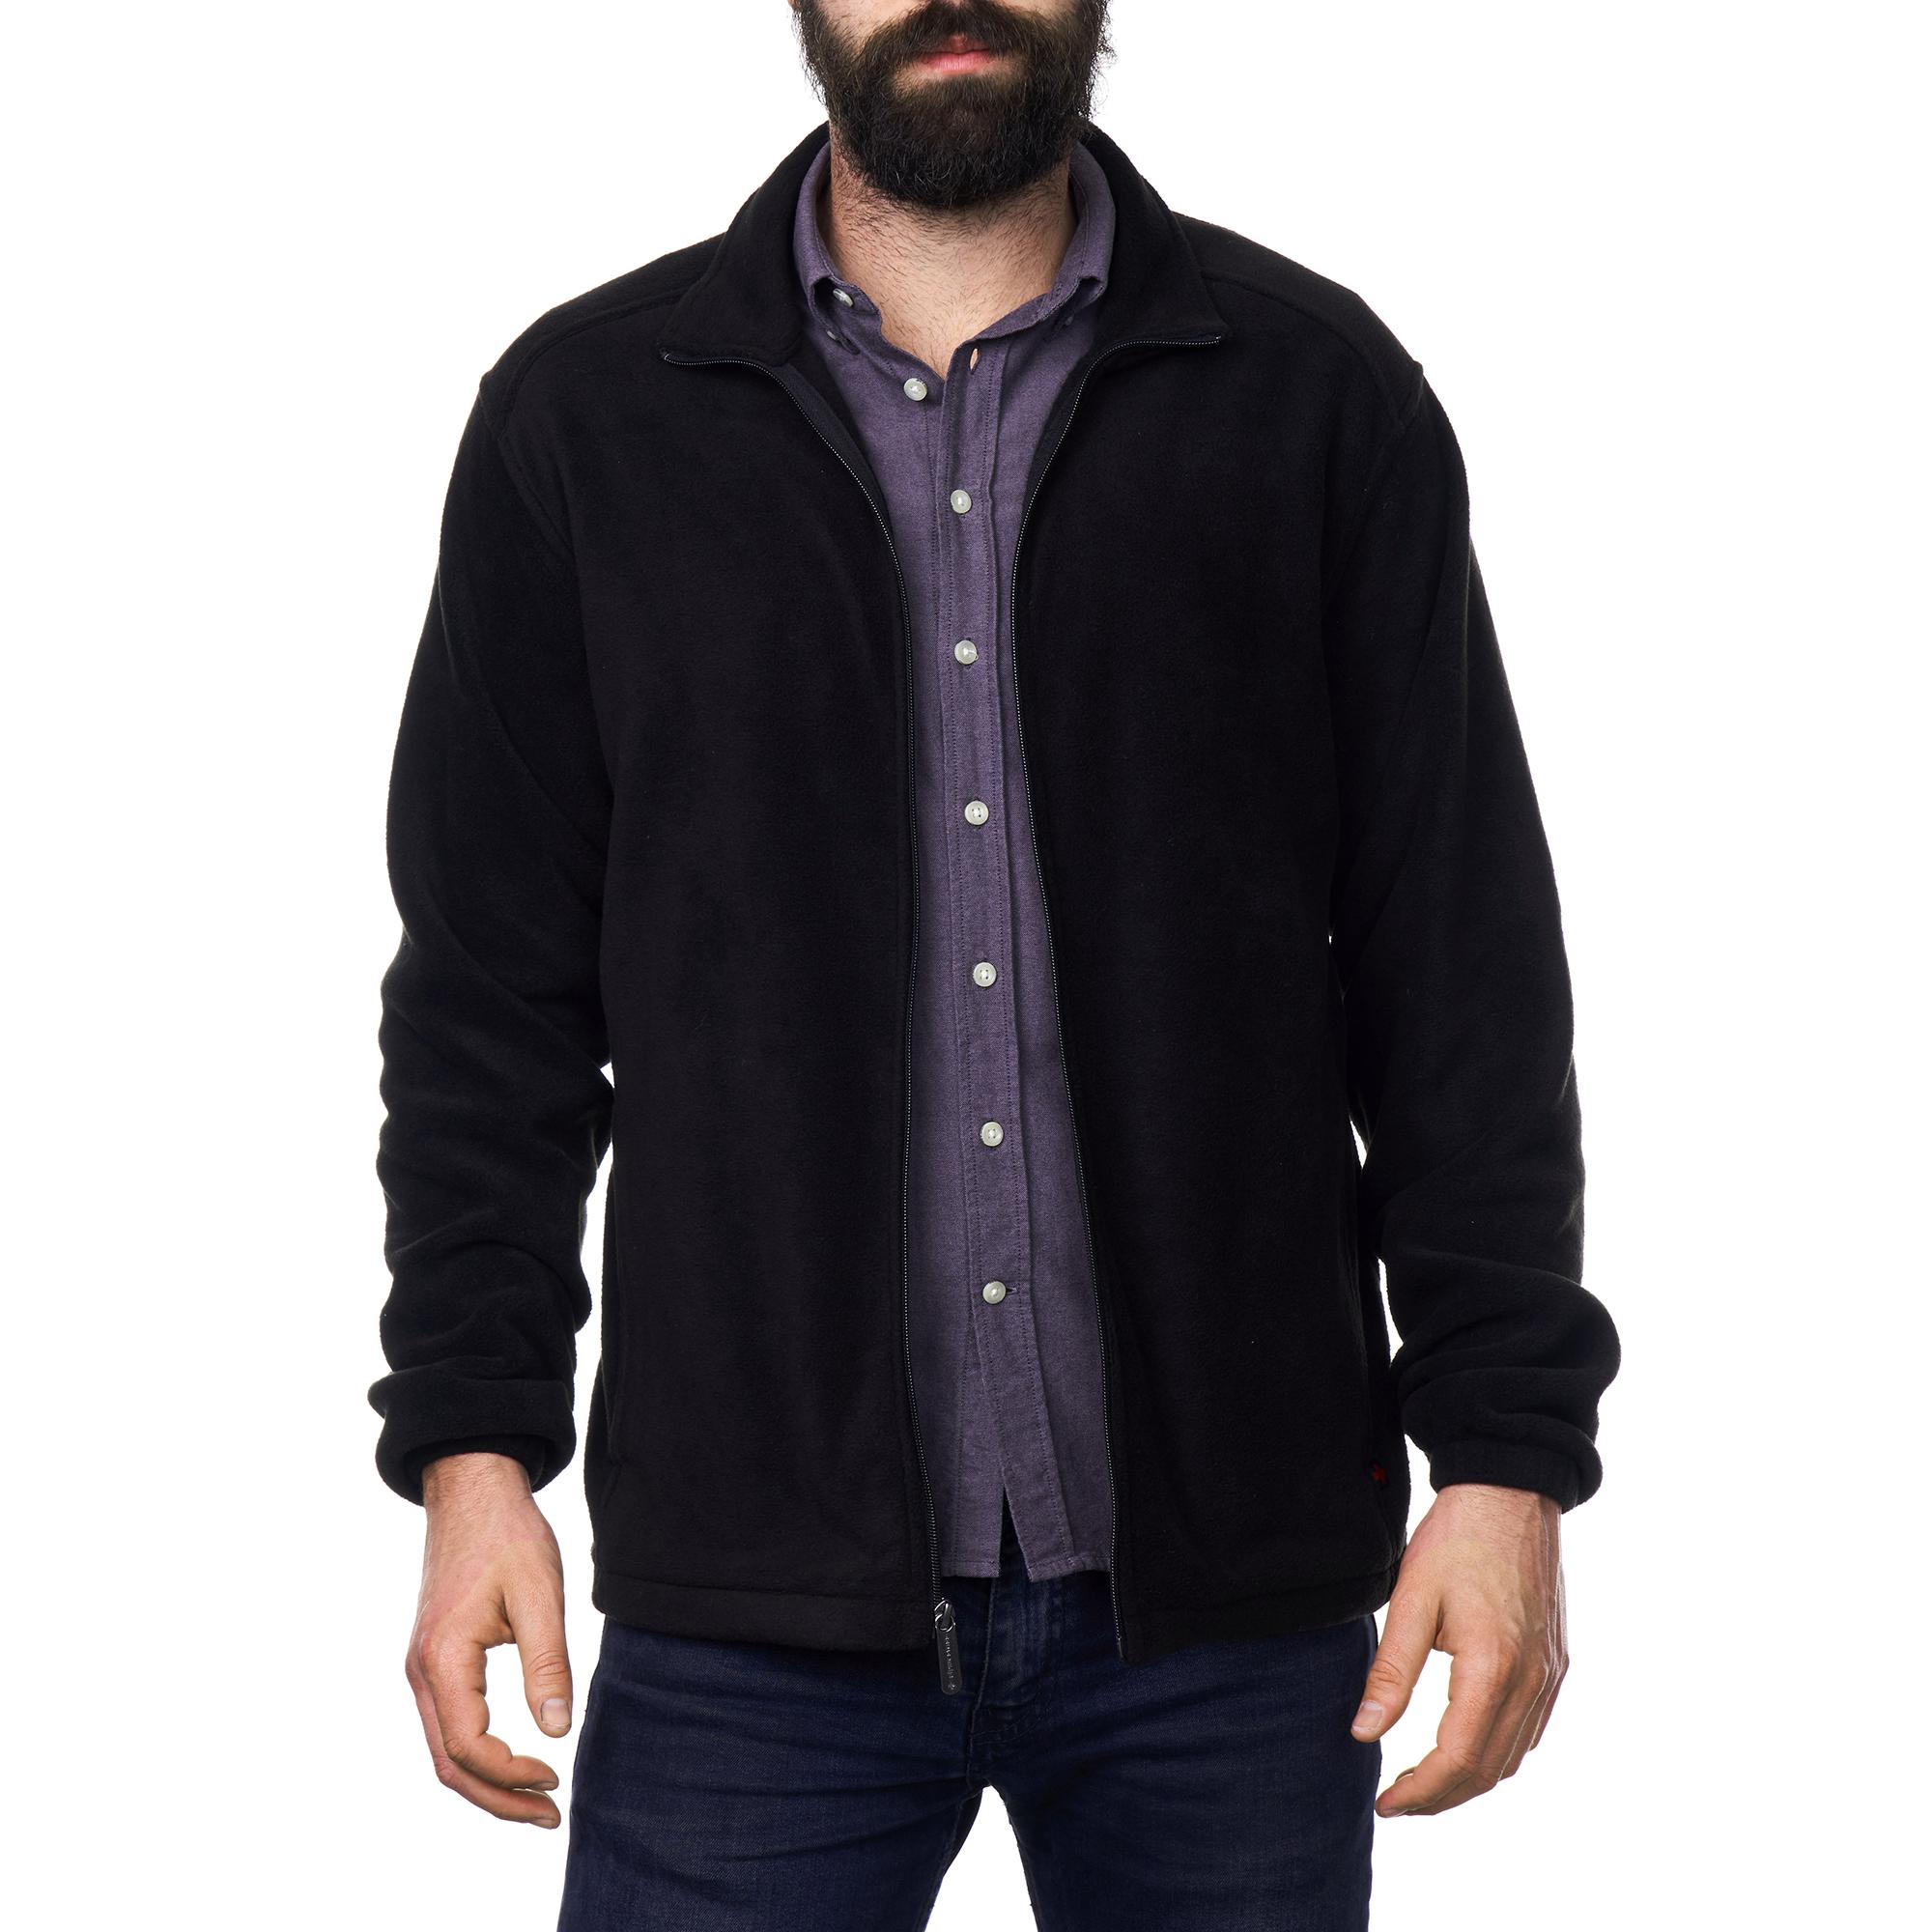 Alpine-Swiss-Trent-Mens-Full-Zip-Up-Fleece-Jacket-Soft-Casual-Warm-Zipper-Coat thumbnail 16